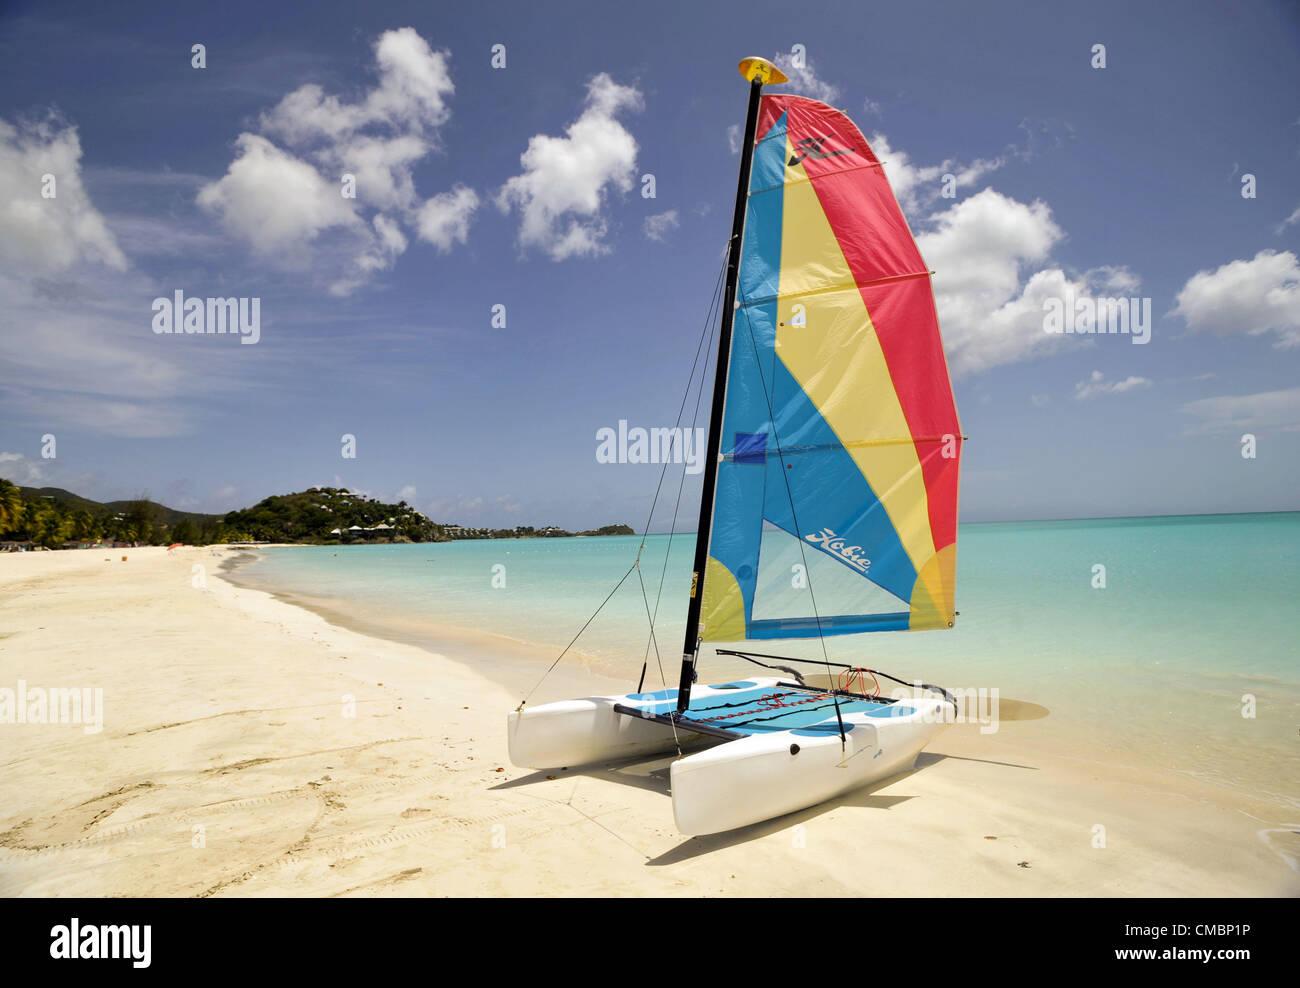 June 19, 2012 - Jolly Beach, Antigua, U.S. - A Hobi Cat sail boat sits ready for action on Jolly Beach on the Caribbean - Stock Image